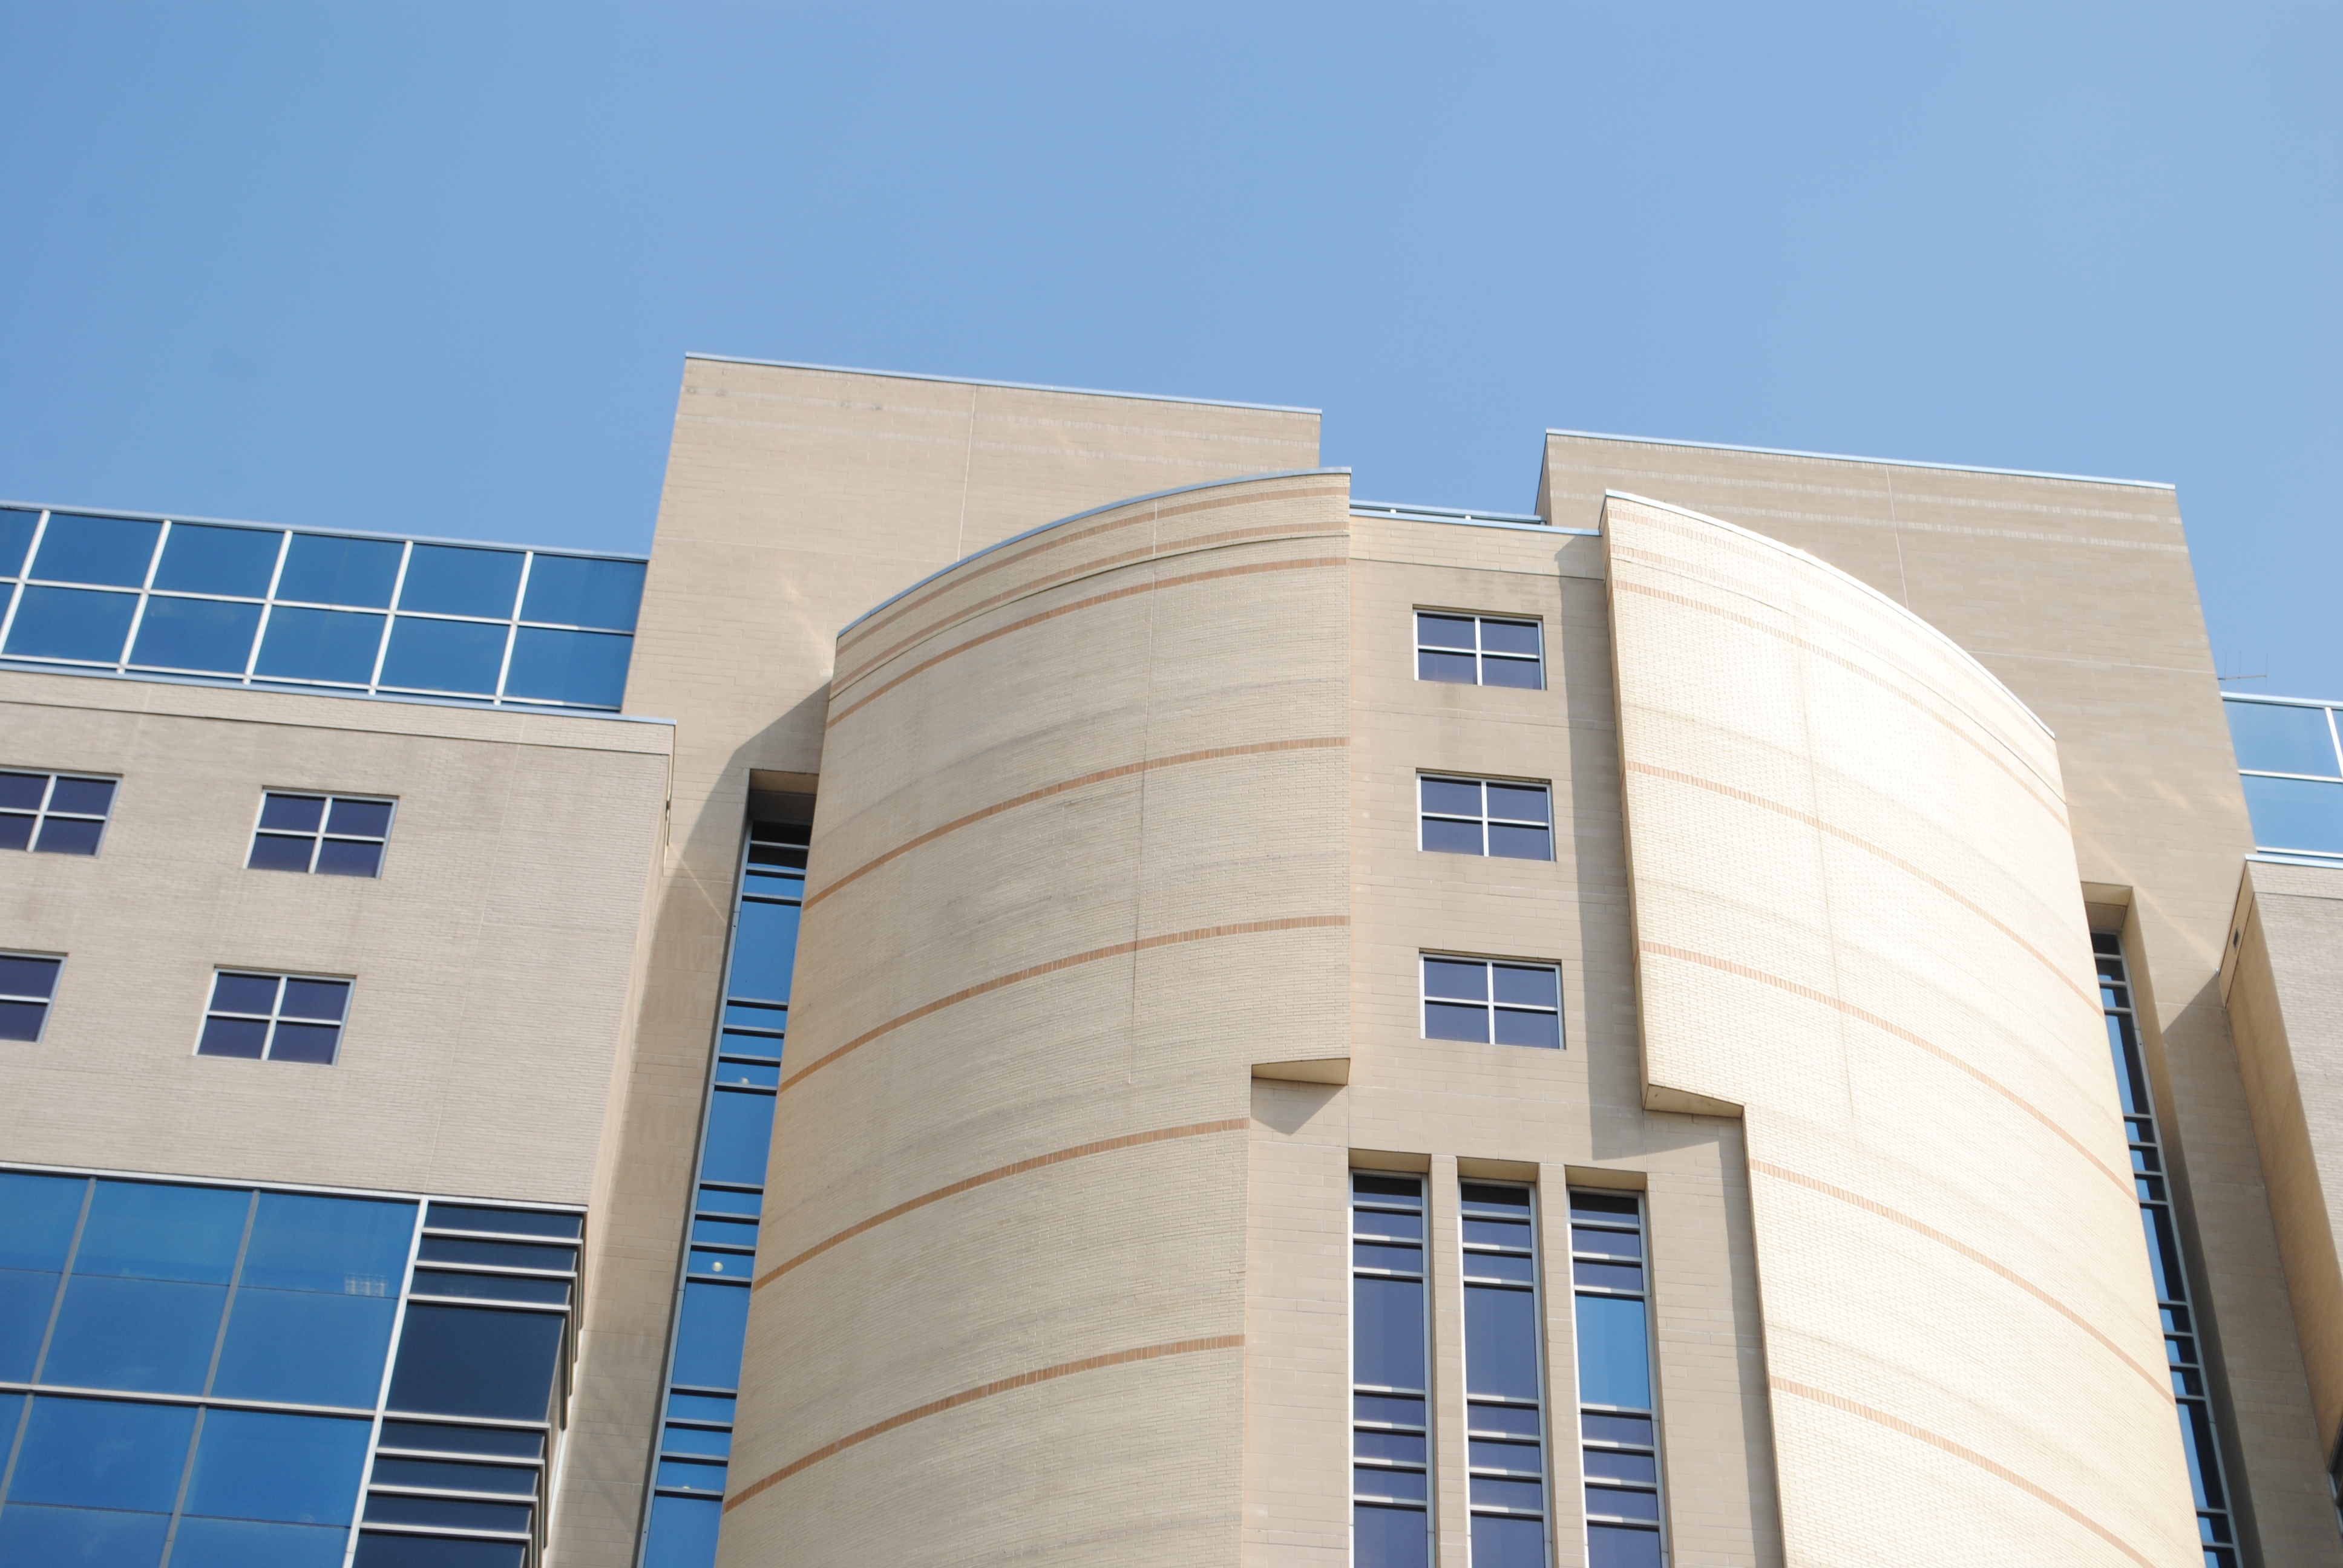 Berks County Services Center Facade Restoration D Huy